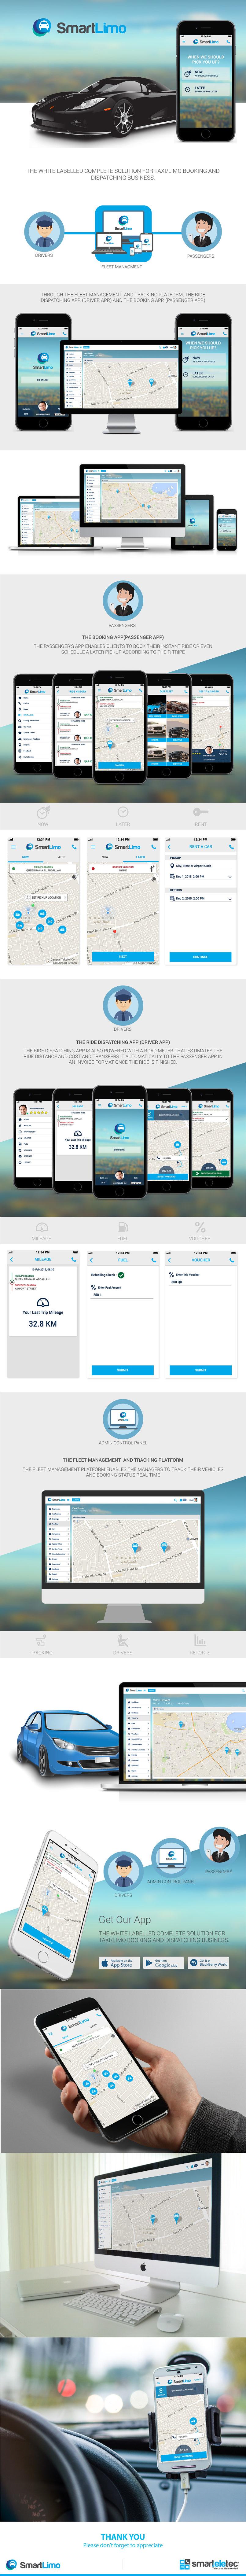 SmartLimo I UI/UX